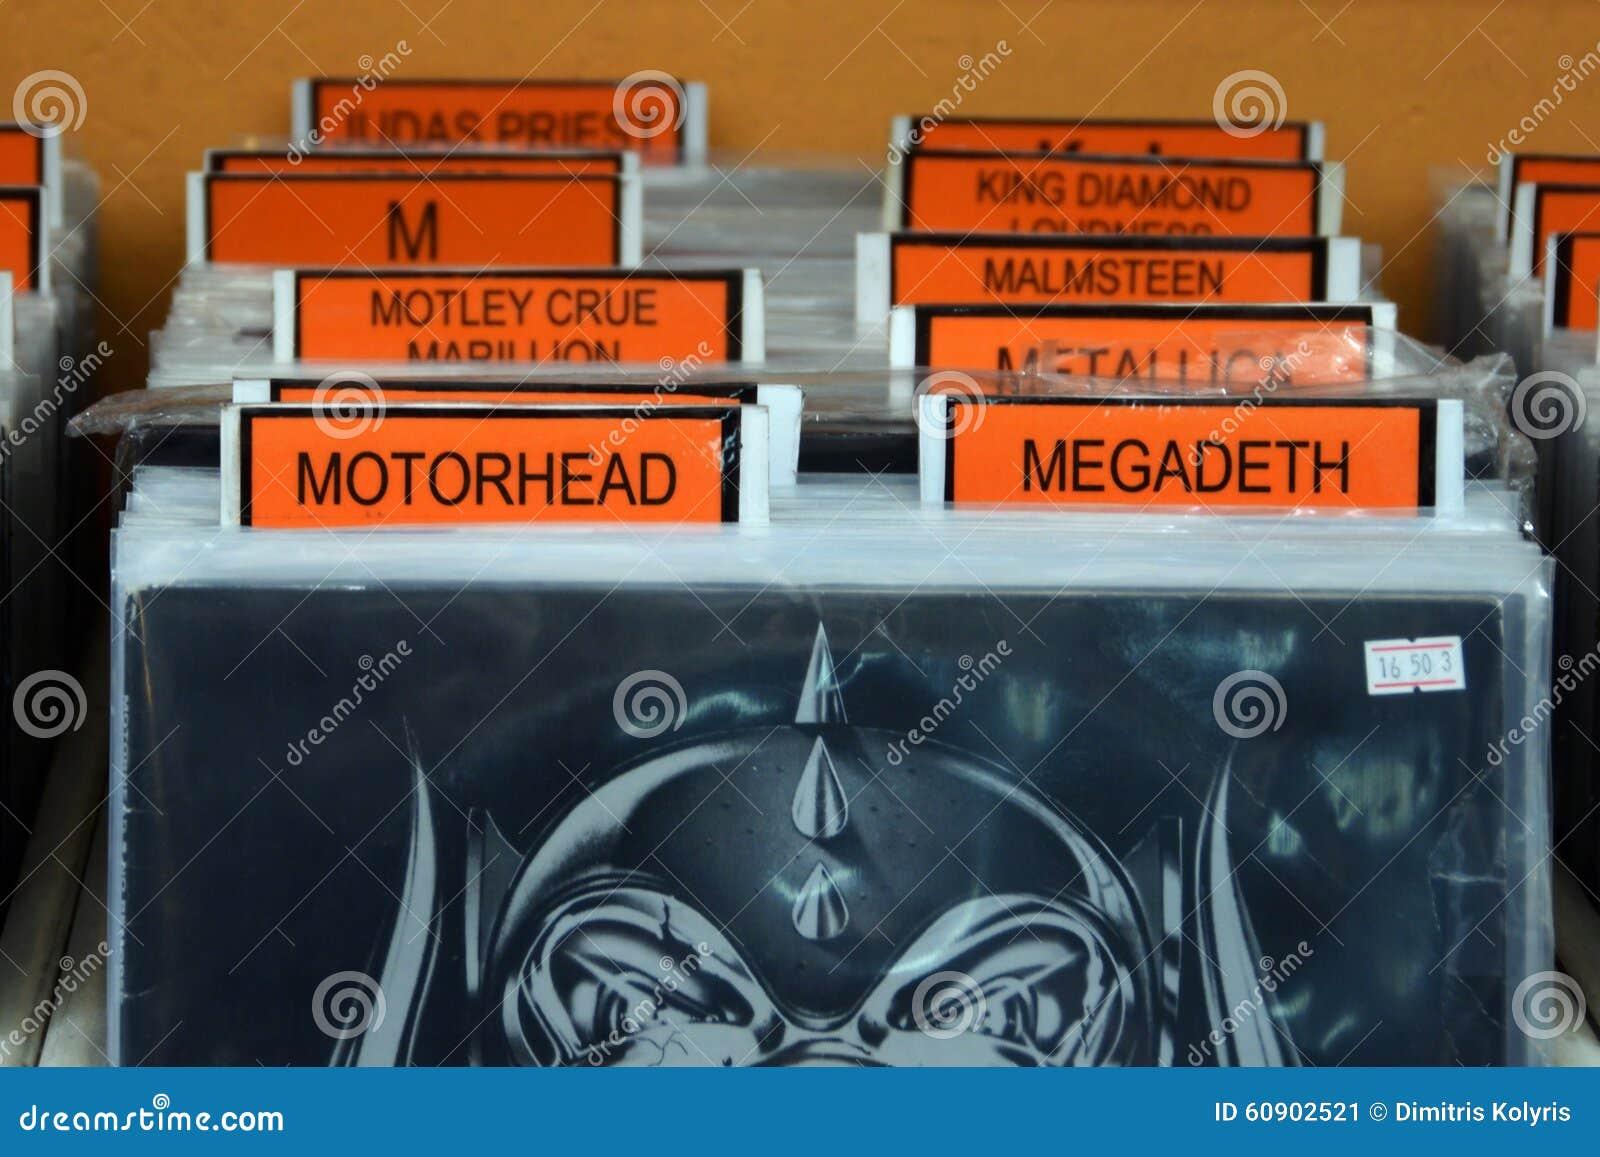 Heavy Metal Music Editorial Photo Image 60902521